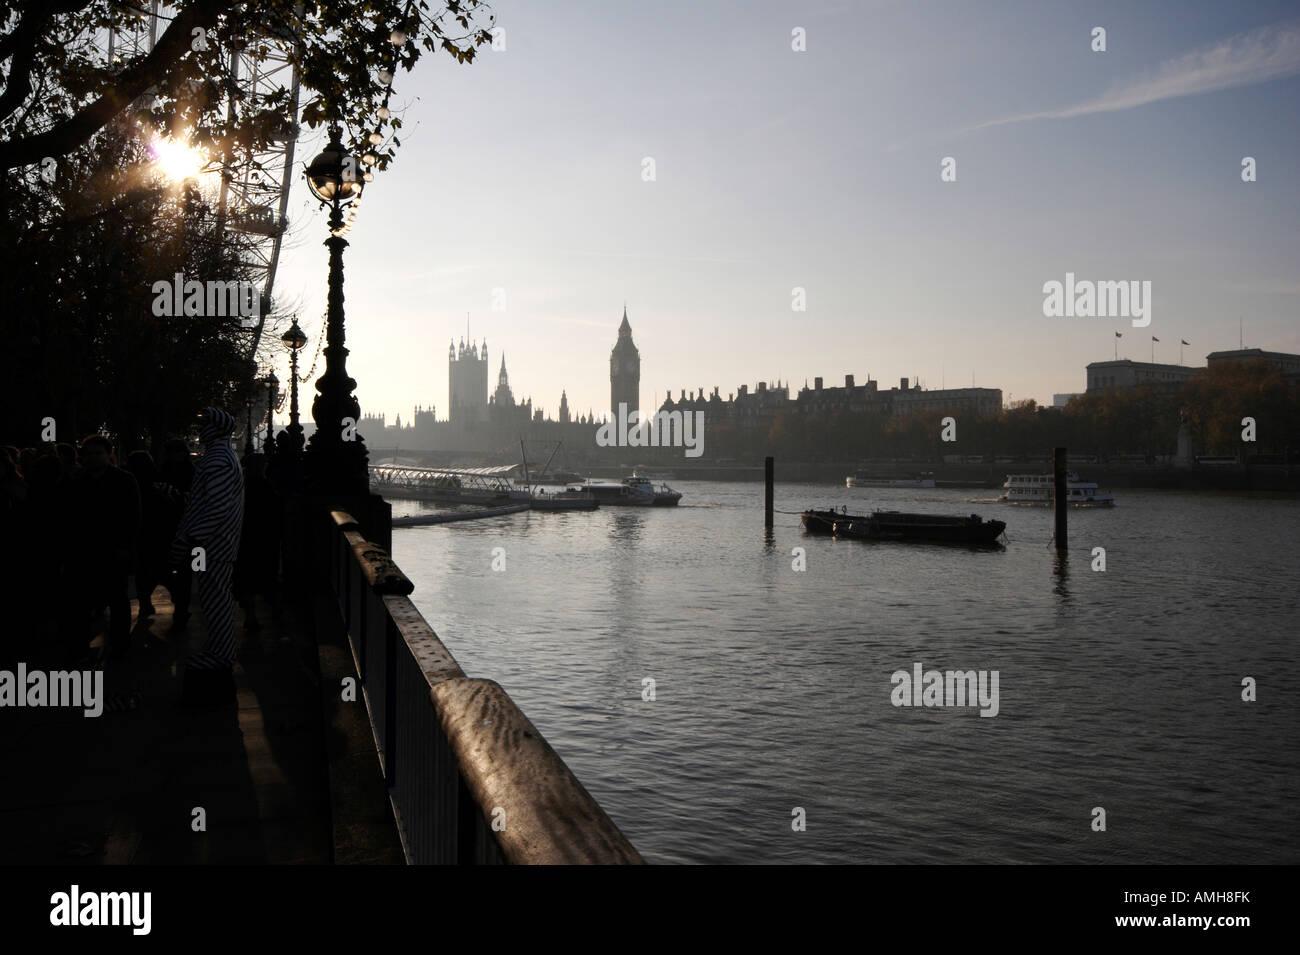 Houses of Parliament, London, England, UK - Stock Image